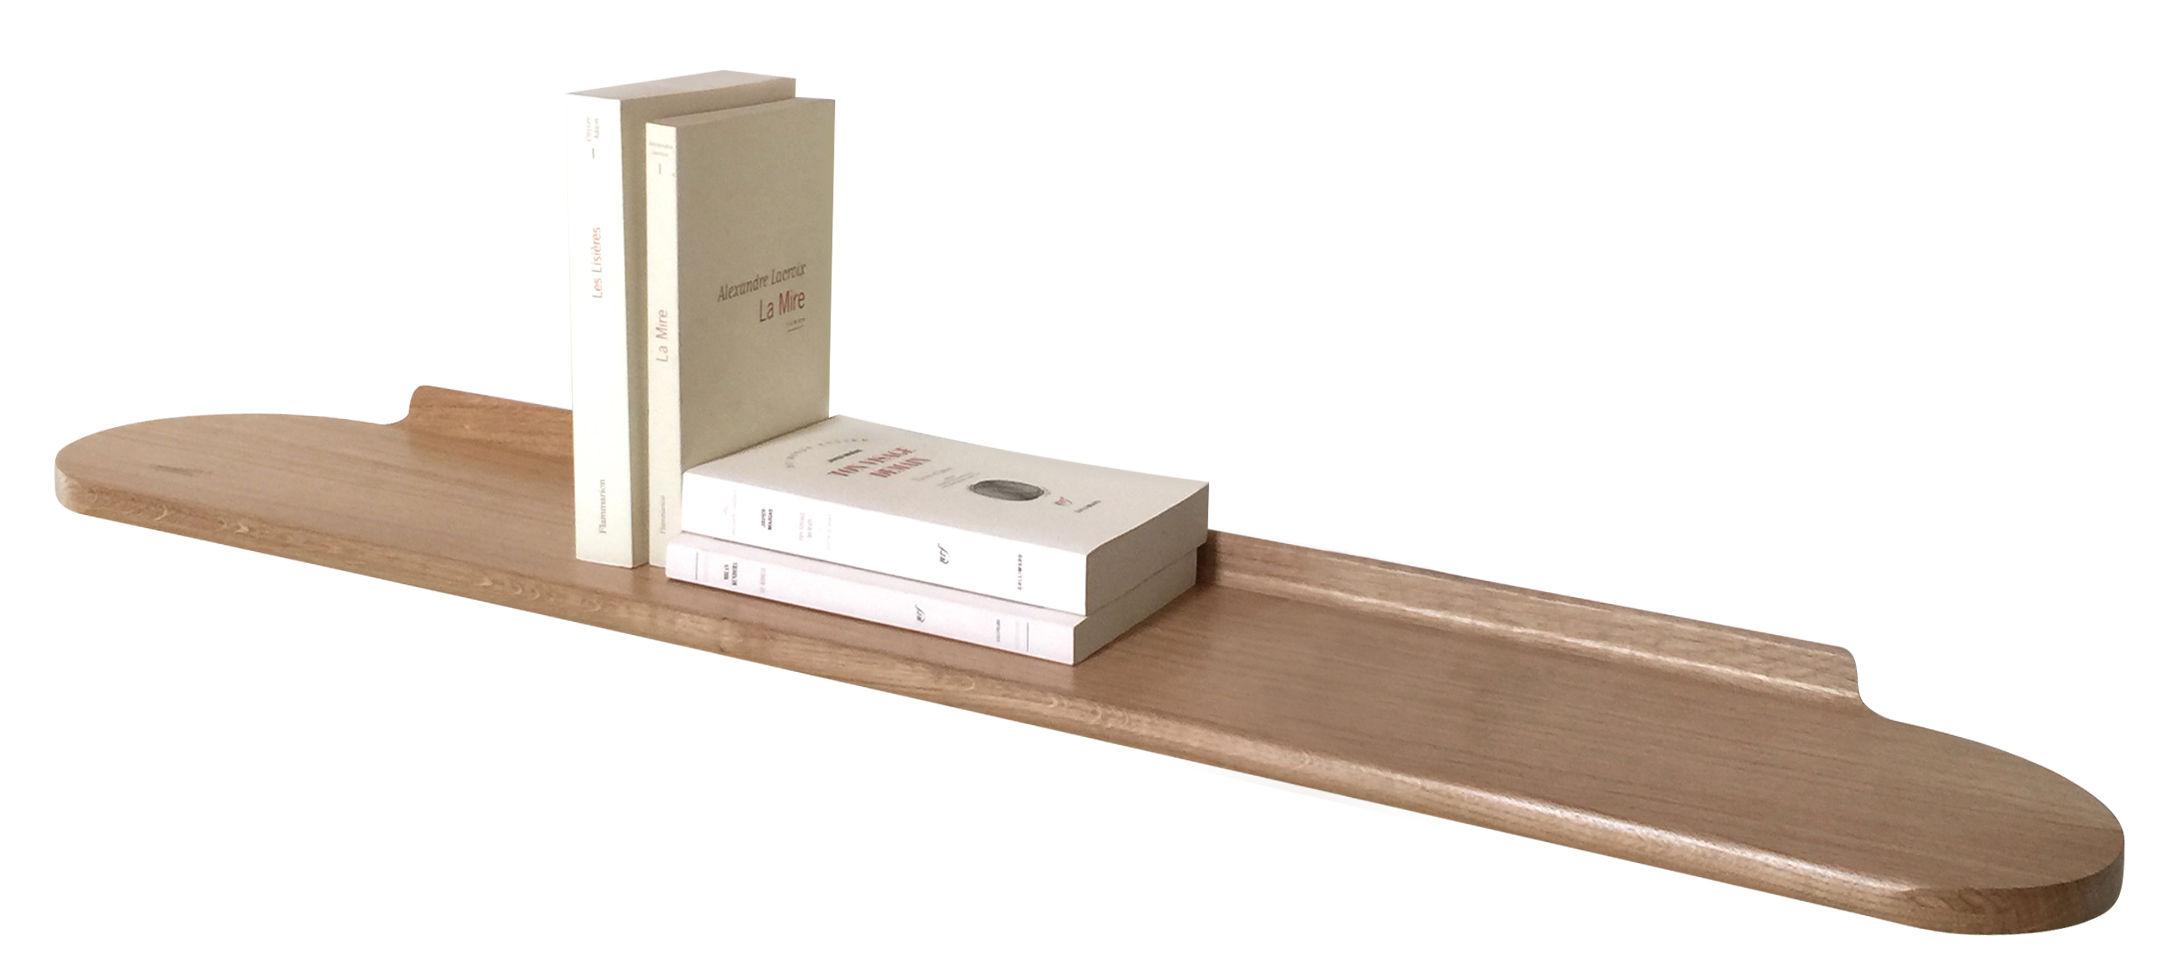 etag re pour support mural xpot bords arrondis ch ne bords arrondis compagnie made in. Black Bedroom Furniture Sets. Home Design Ideas